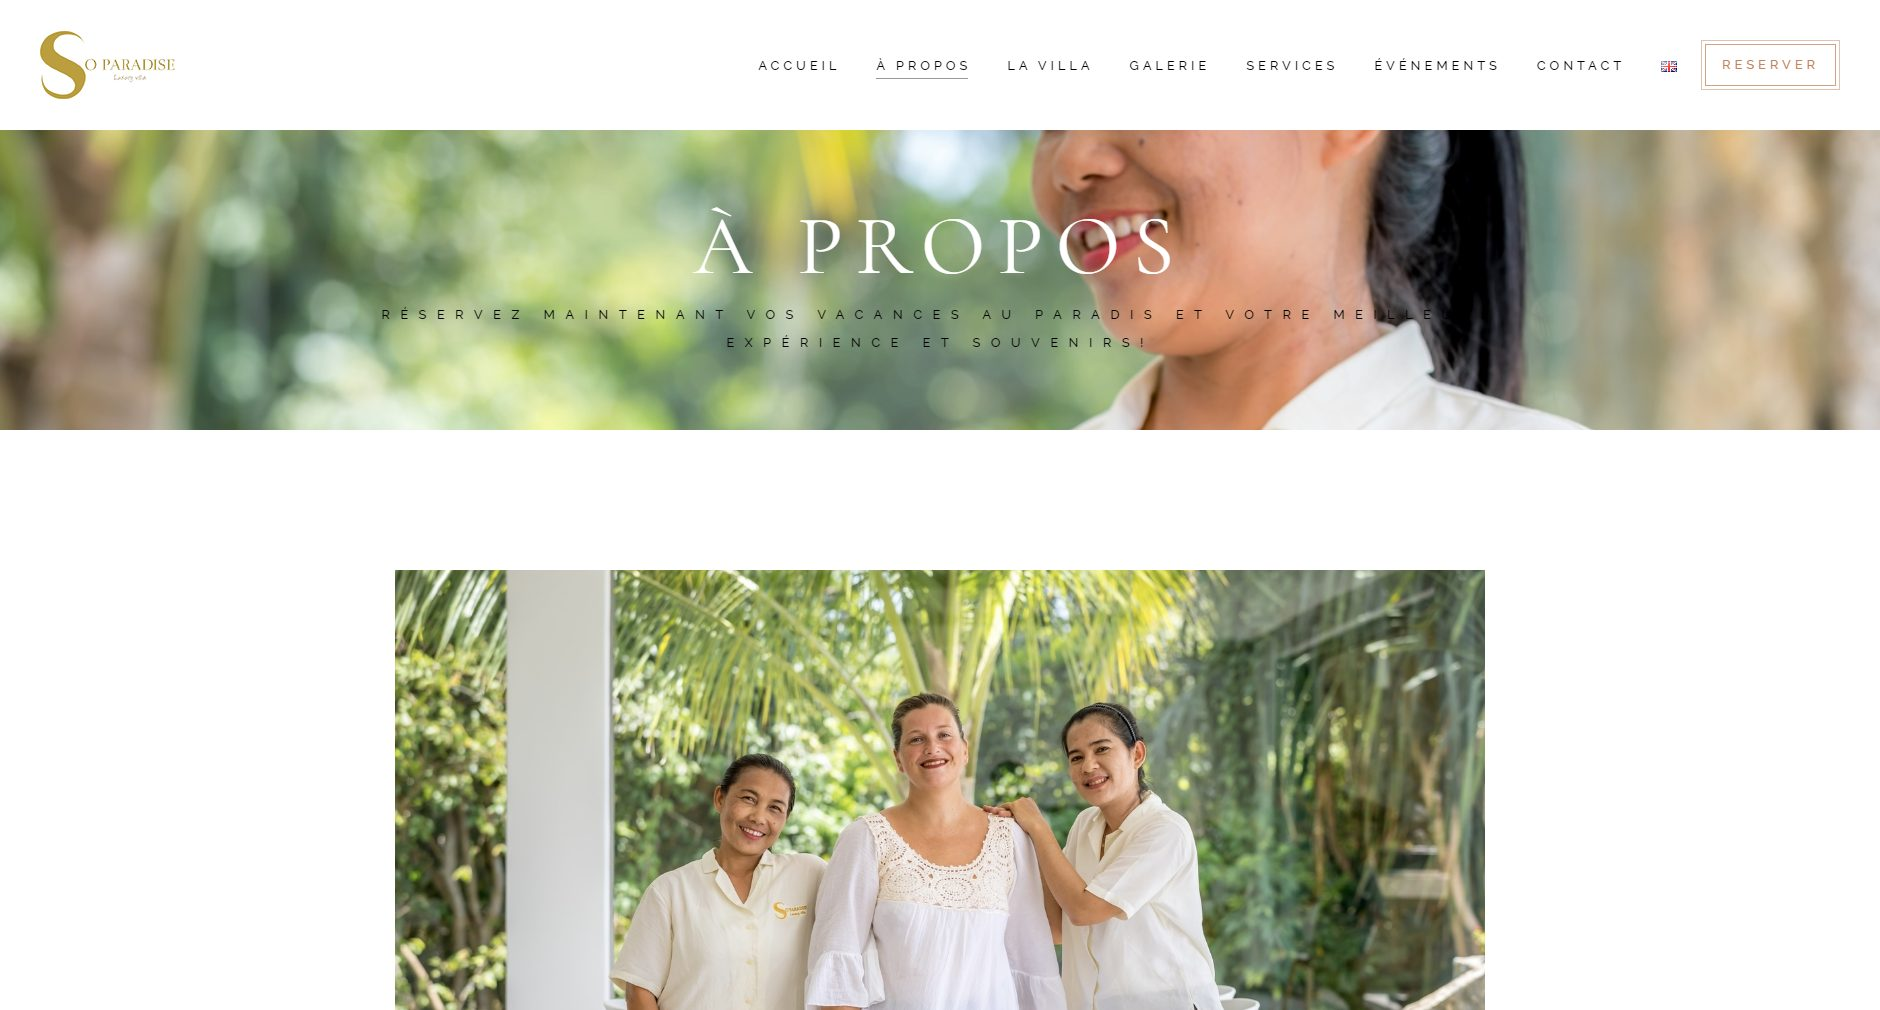 Website – So Paradise